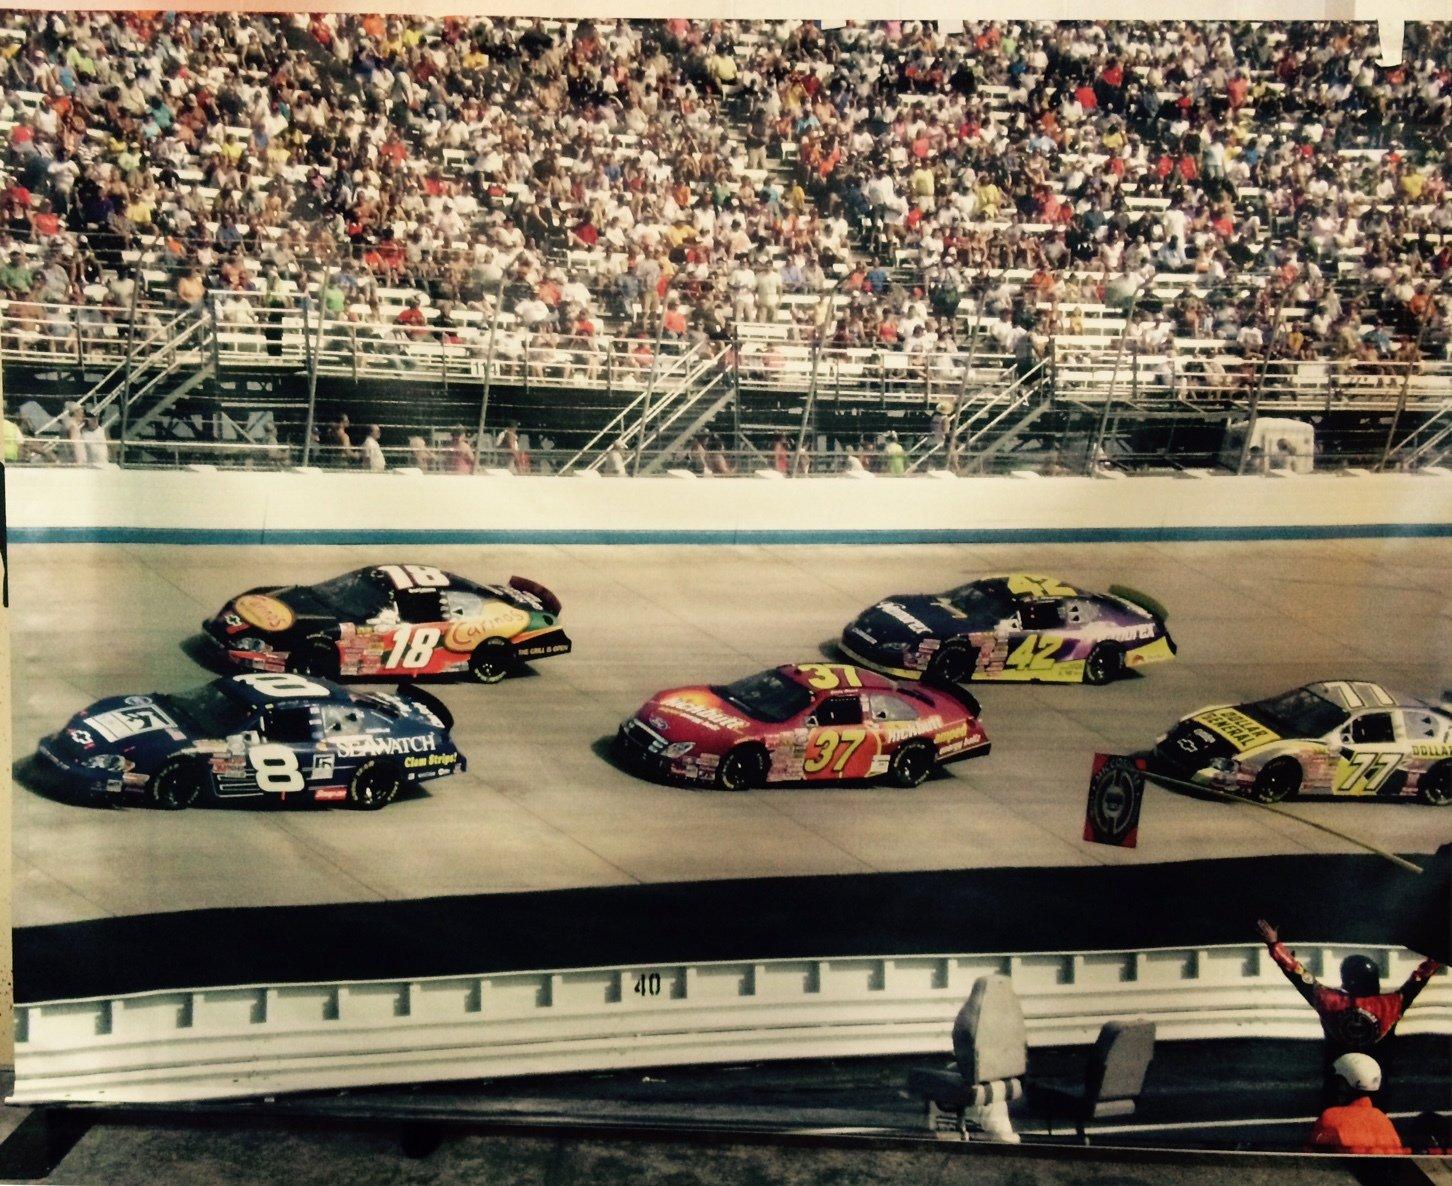 Backdrop Race Car Scene 3m x 2.3m $60 incl frame& gst